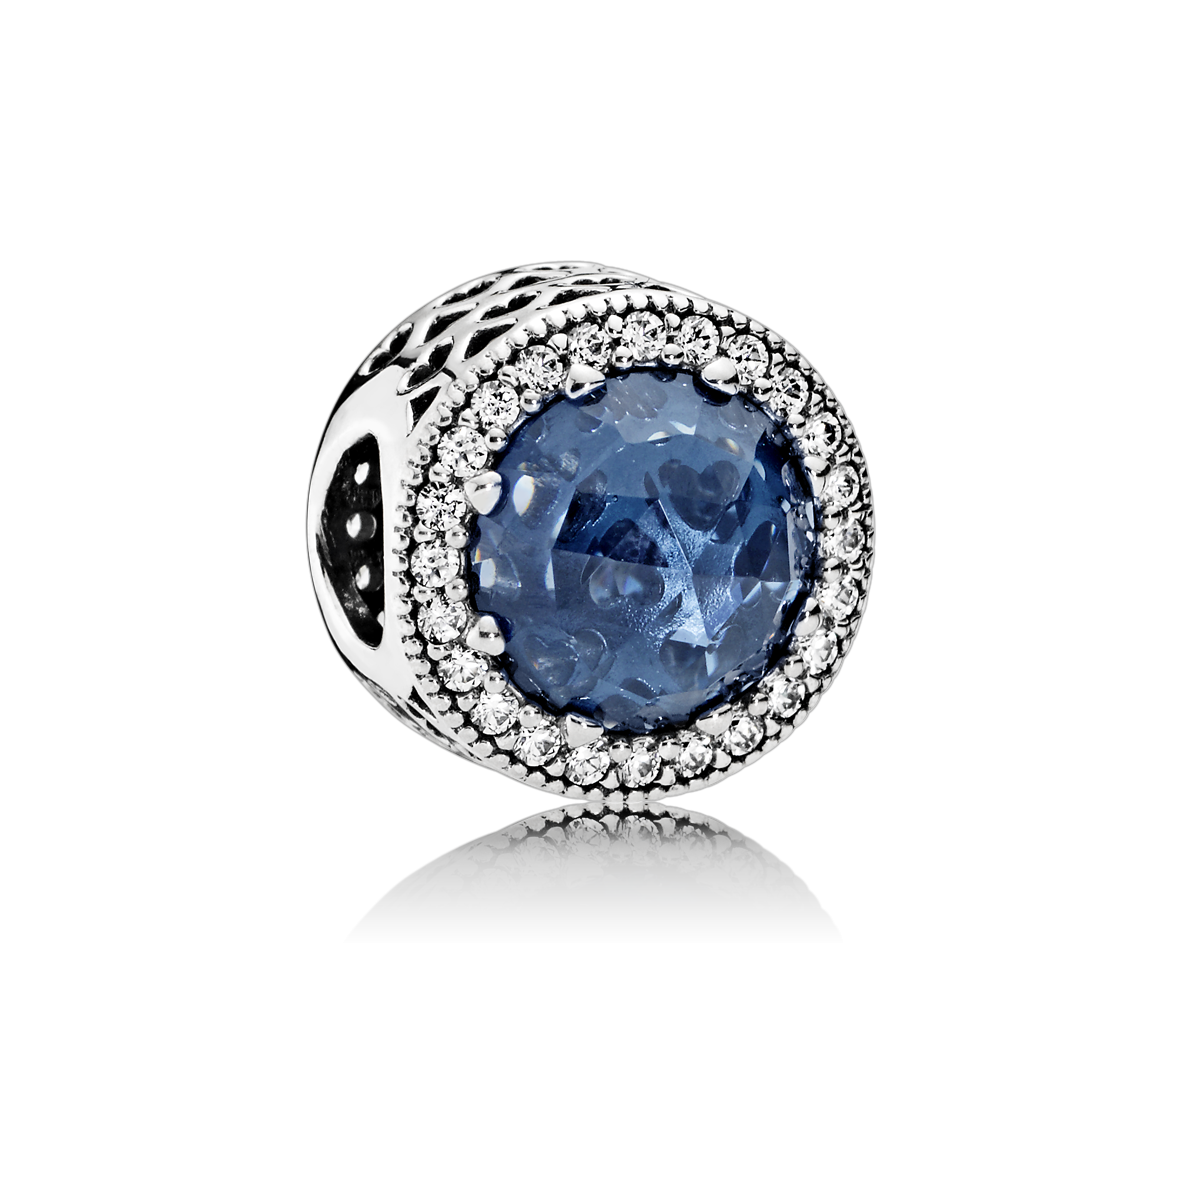 : - Blå kristallberlock